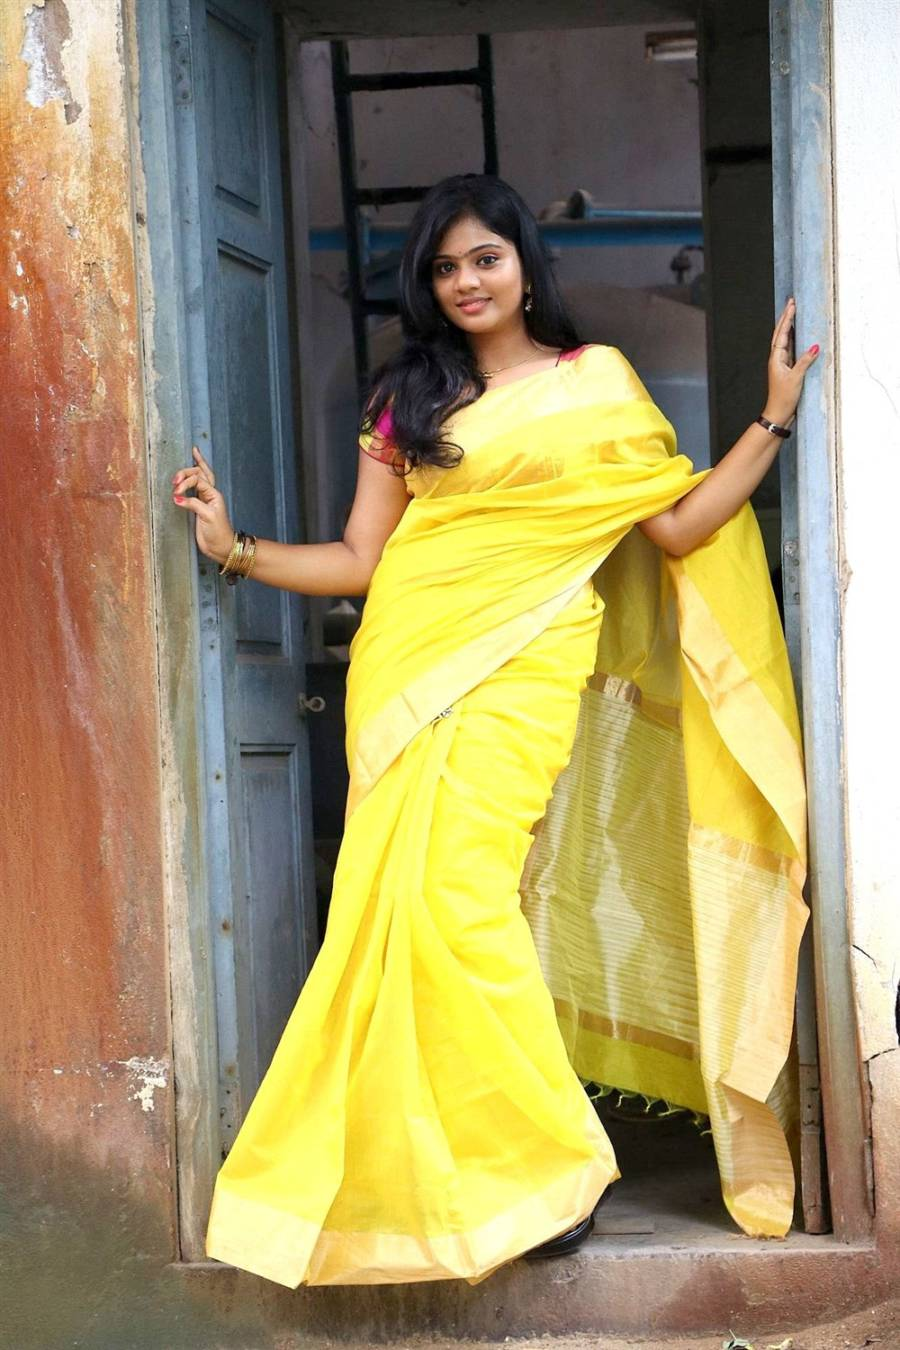 Beautiful Tamil Girl Megana In Traditional Indian Yellow ...